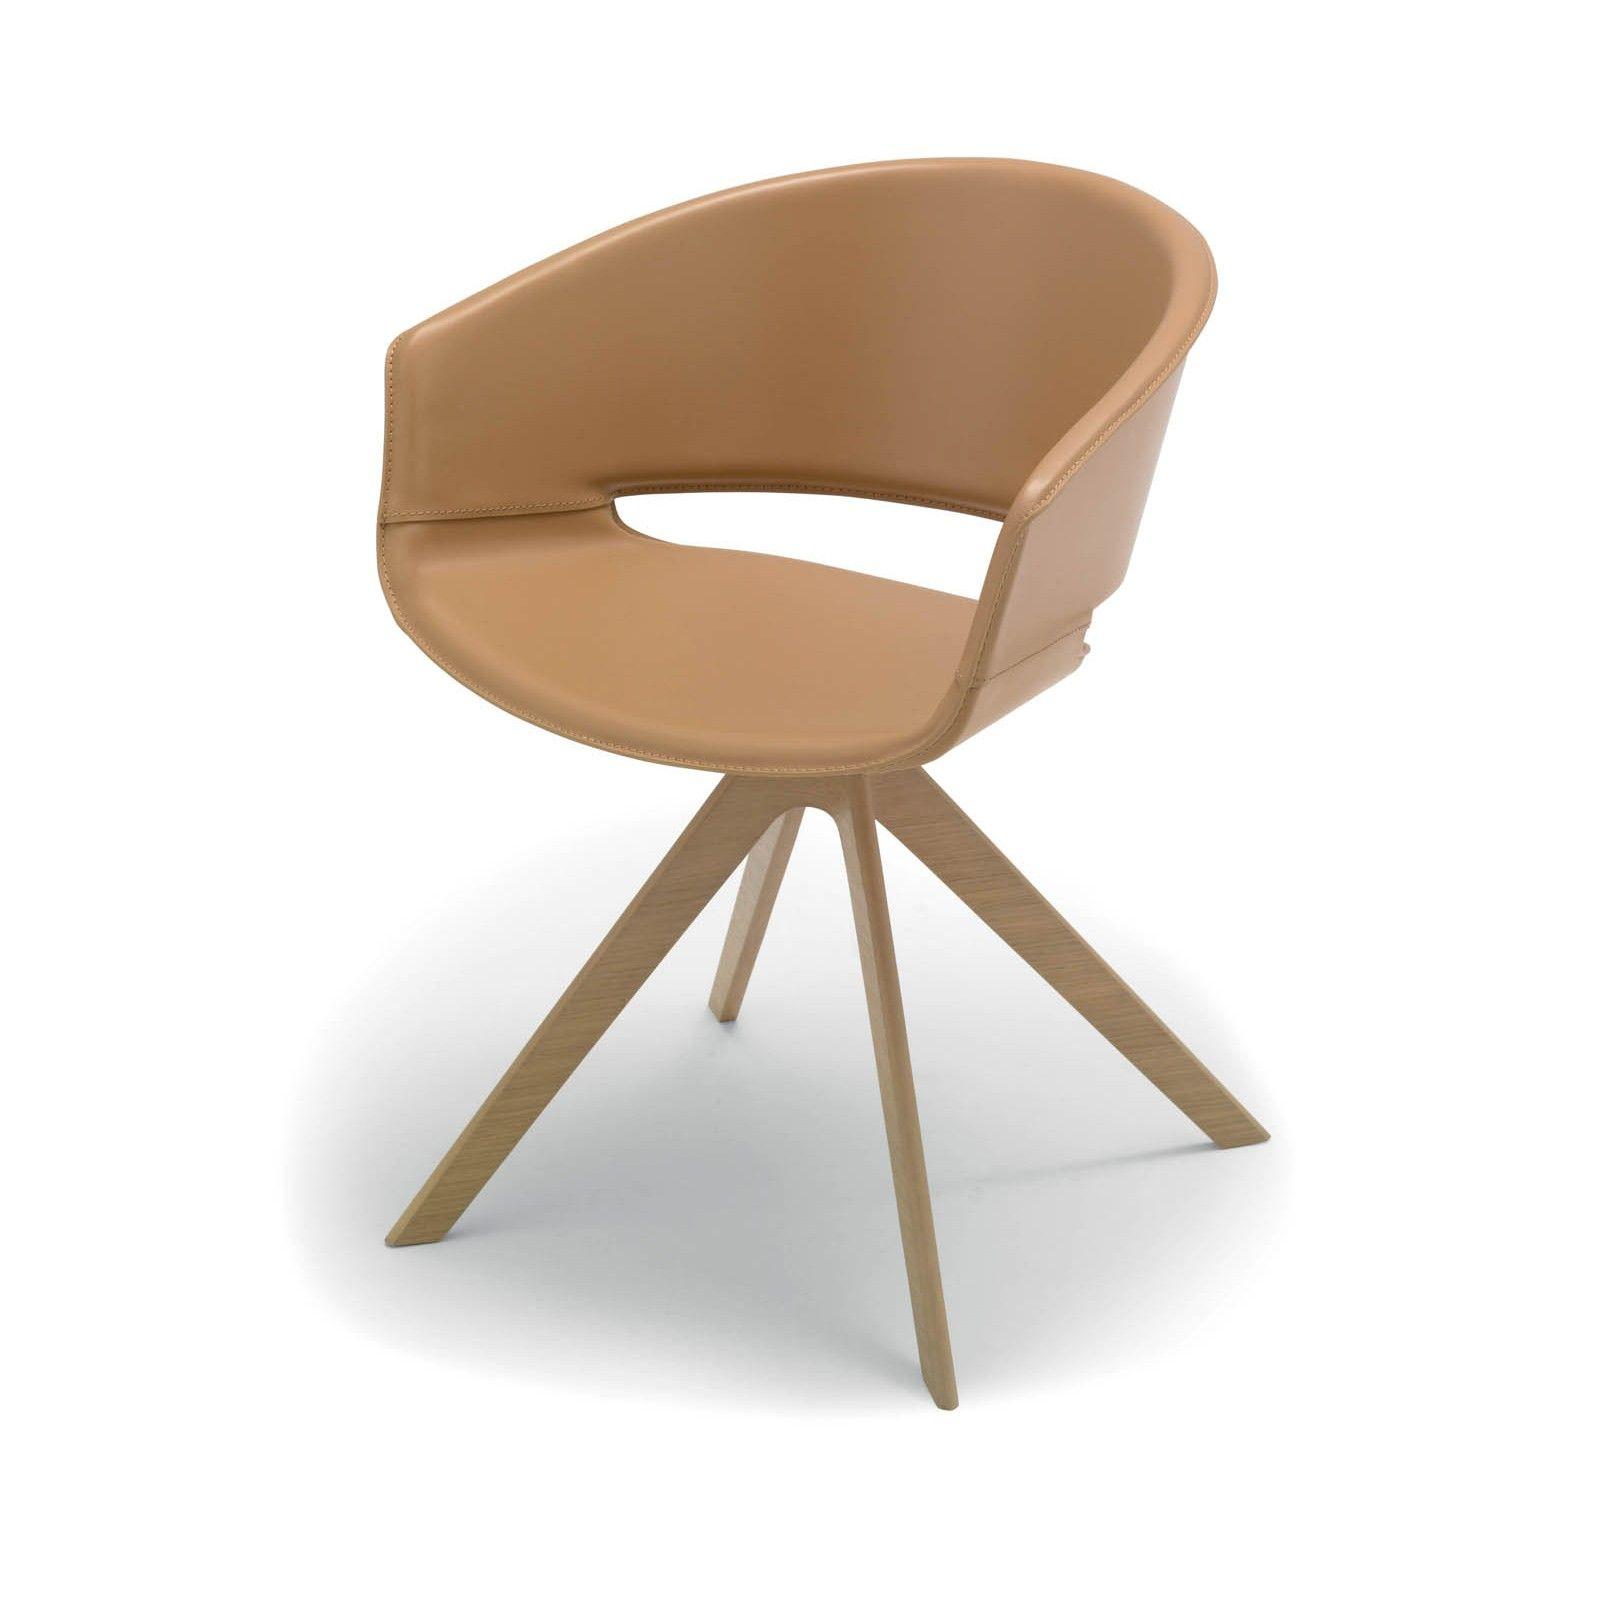 Andreu World, Ronda, Lievore Altherr Molina, Designer Throughout Ronda Barrel Chairs (View 13 of 15)